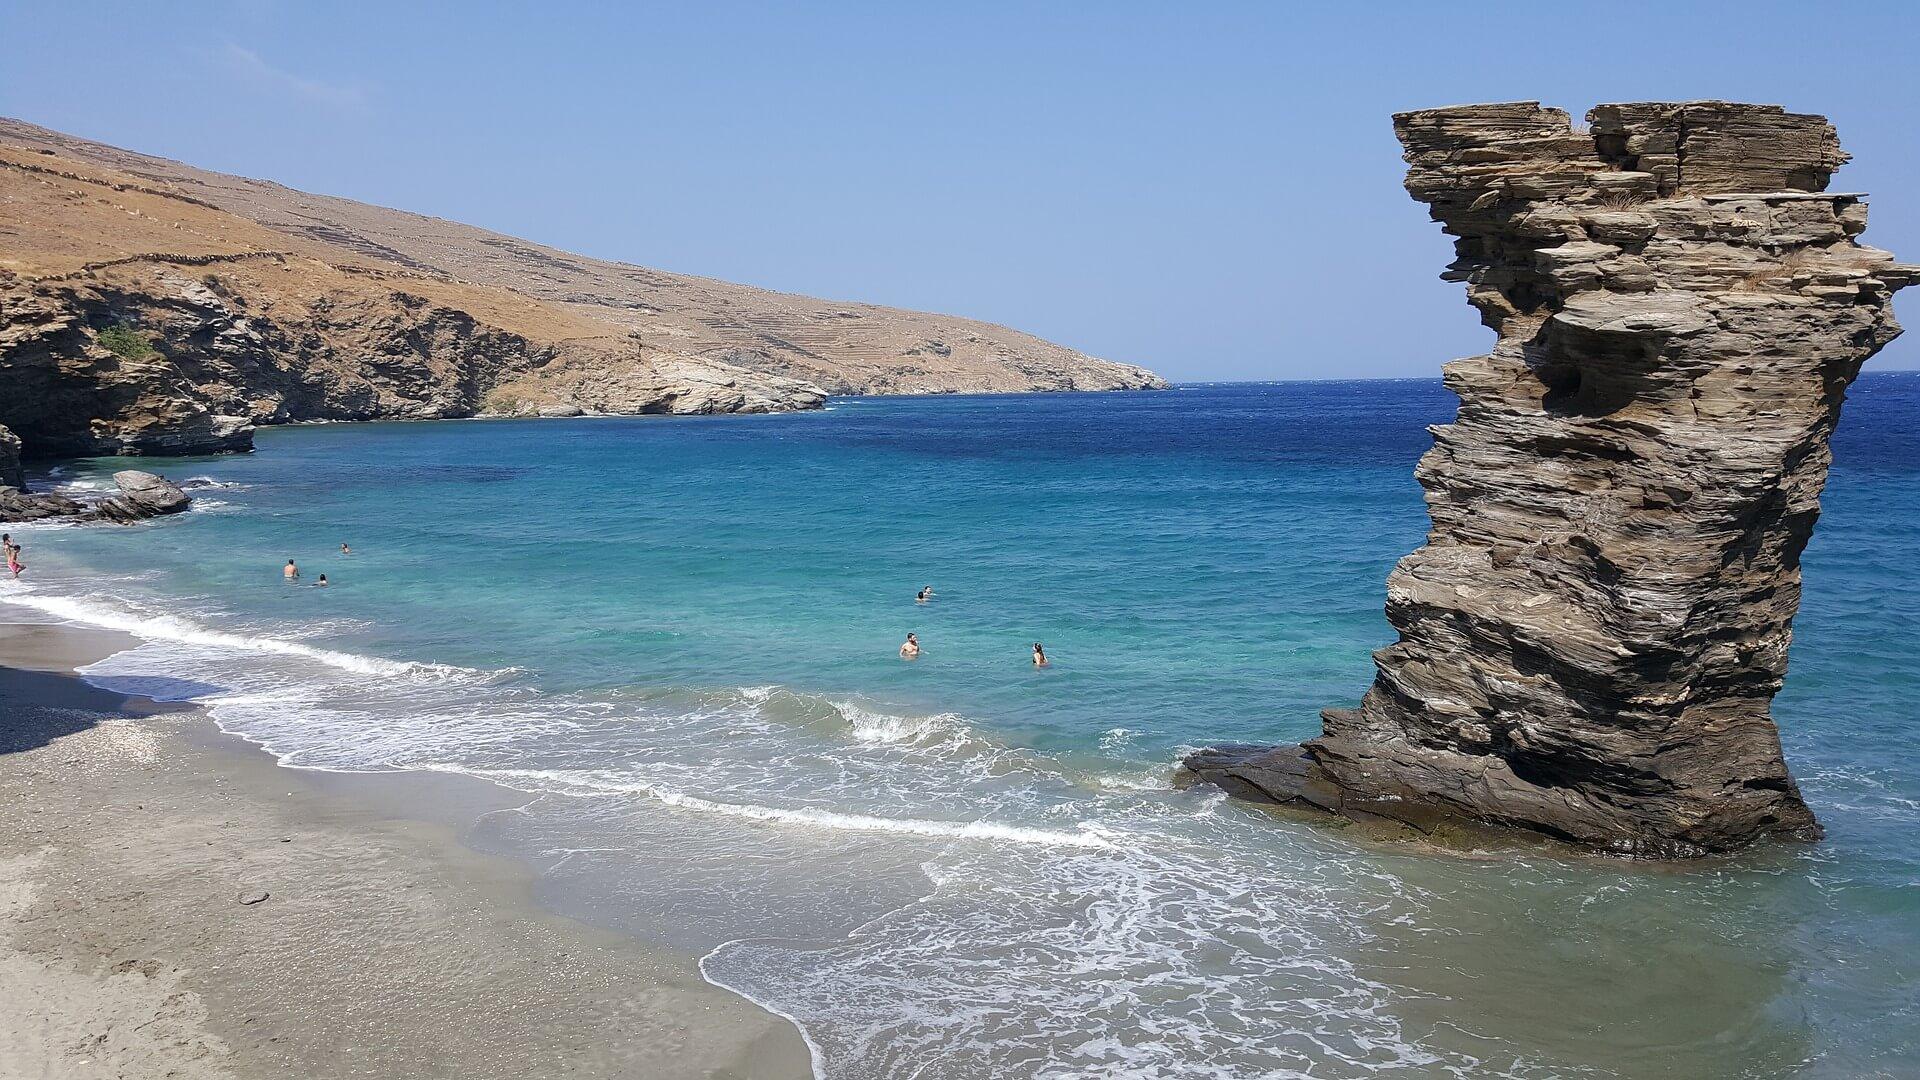 andros jedinstveno ostrvo kiklada header grckaisrbija